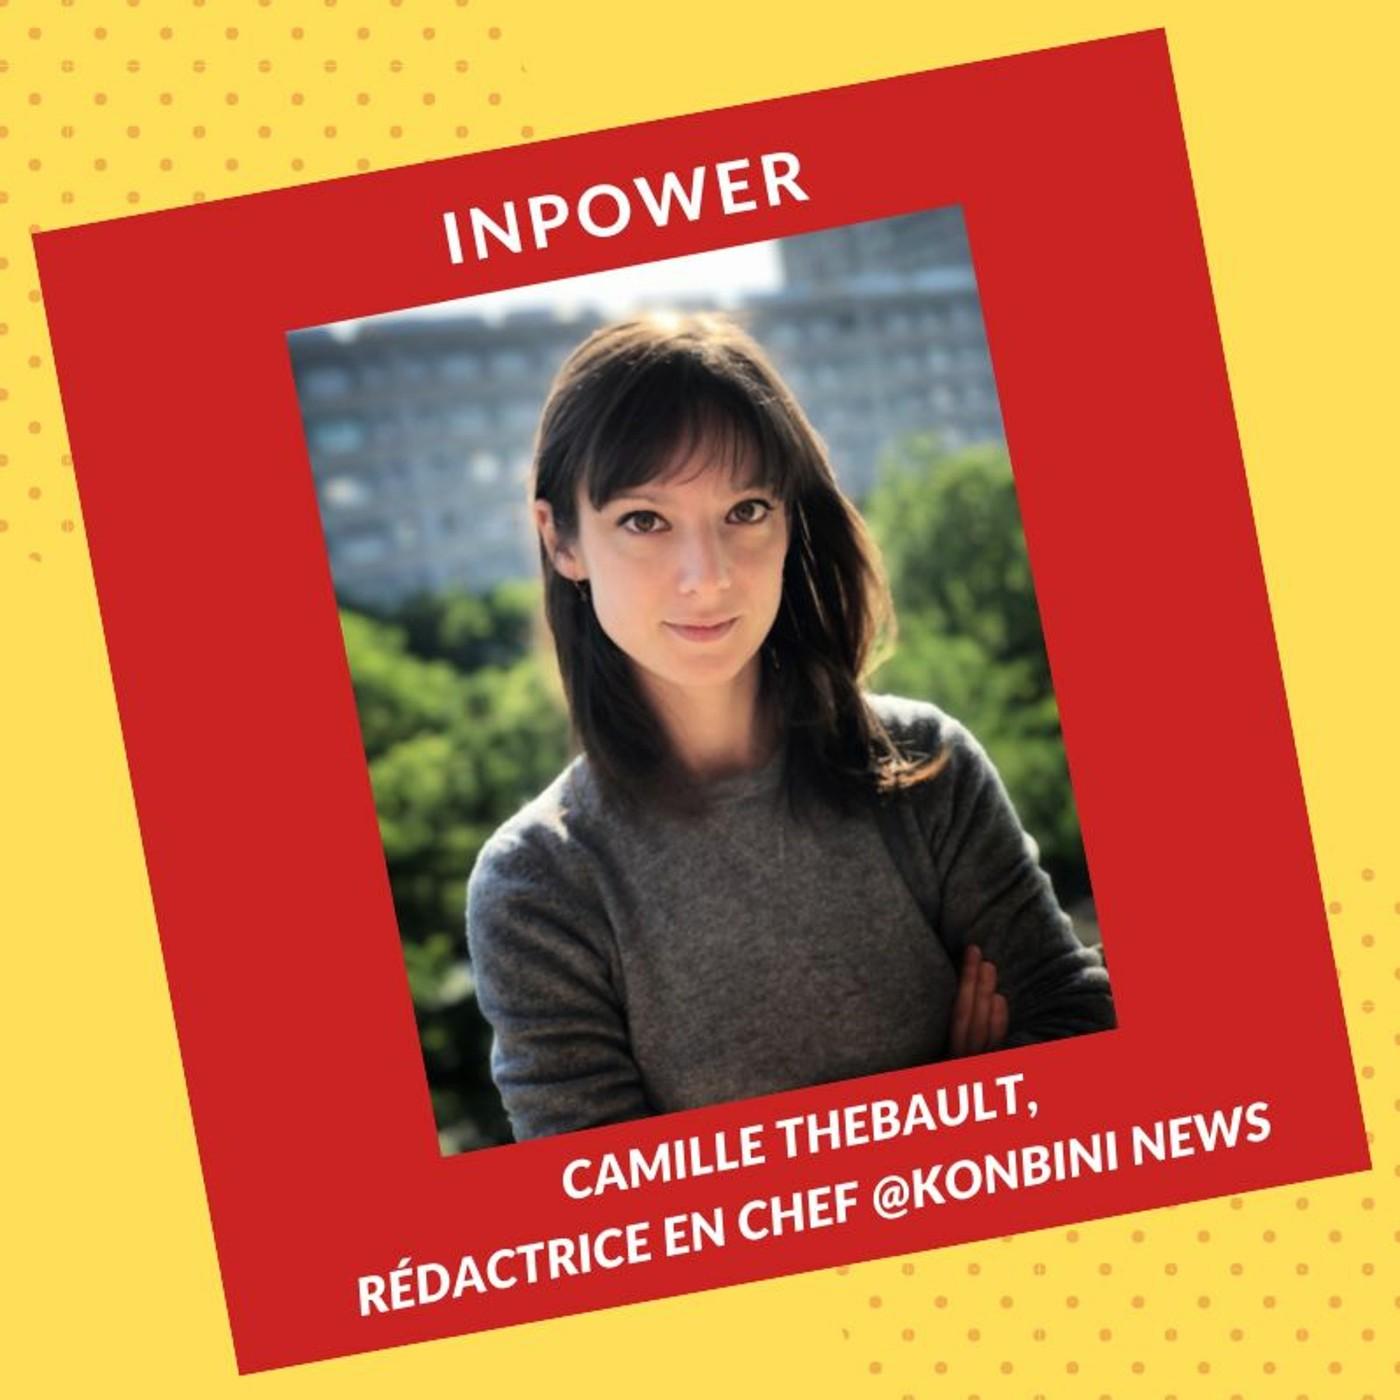 Camille Thebault, Rédactrice en Chef @KonbiniNews